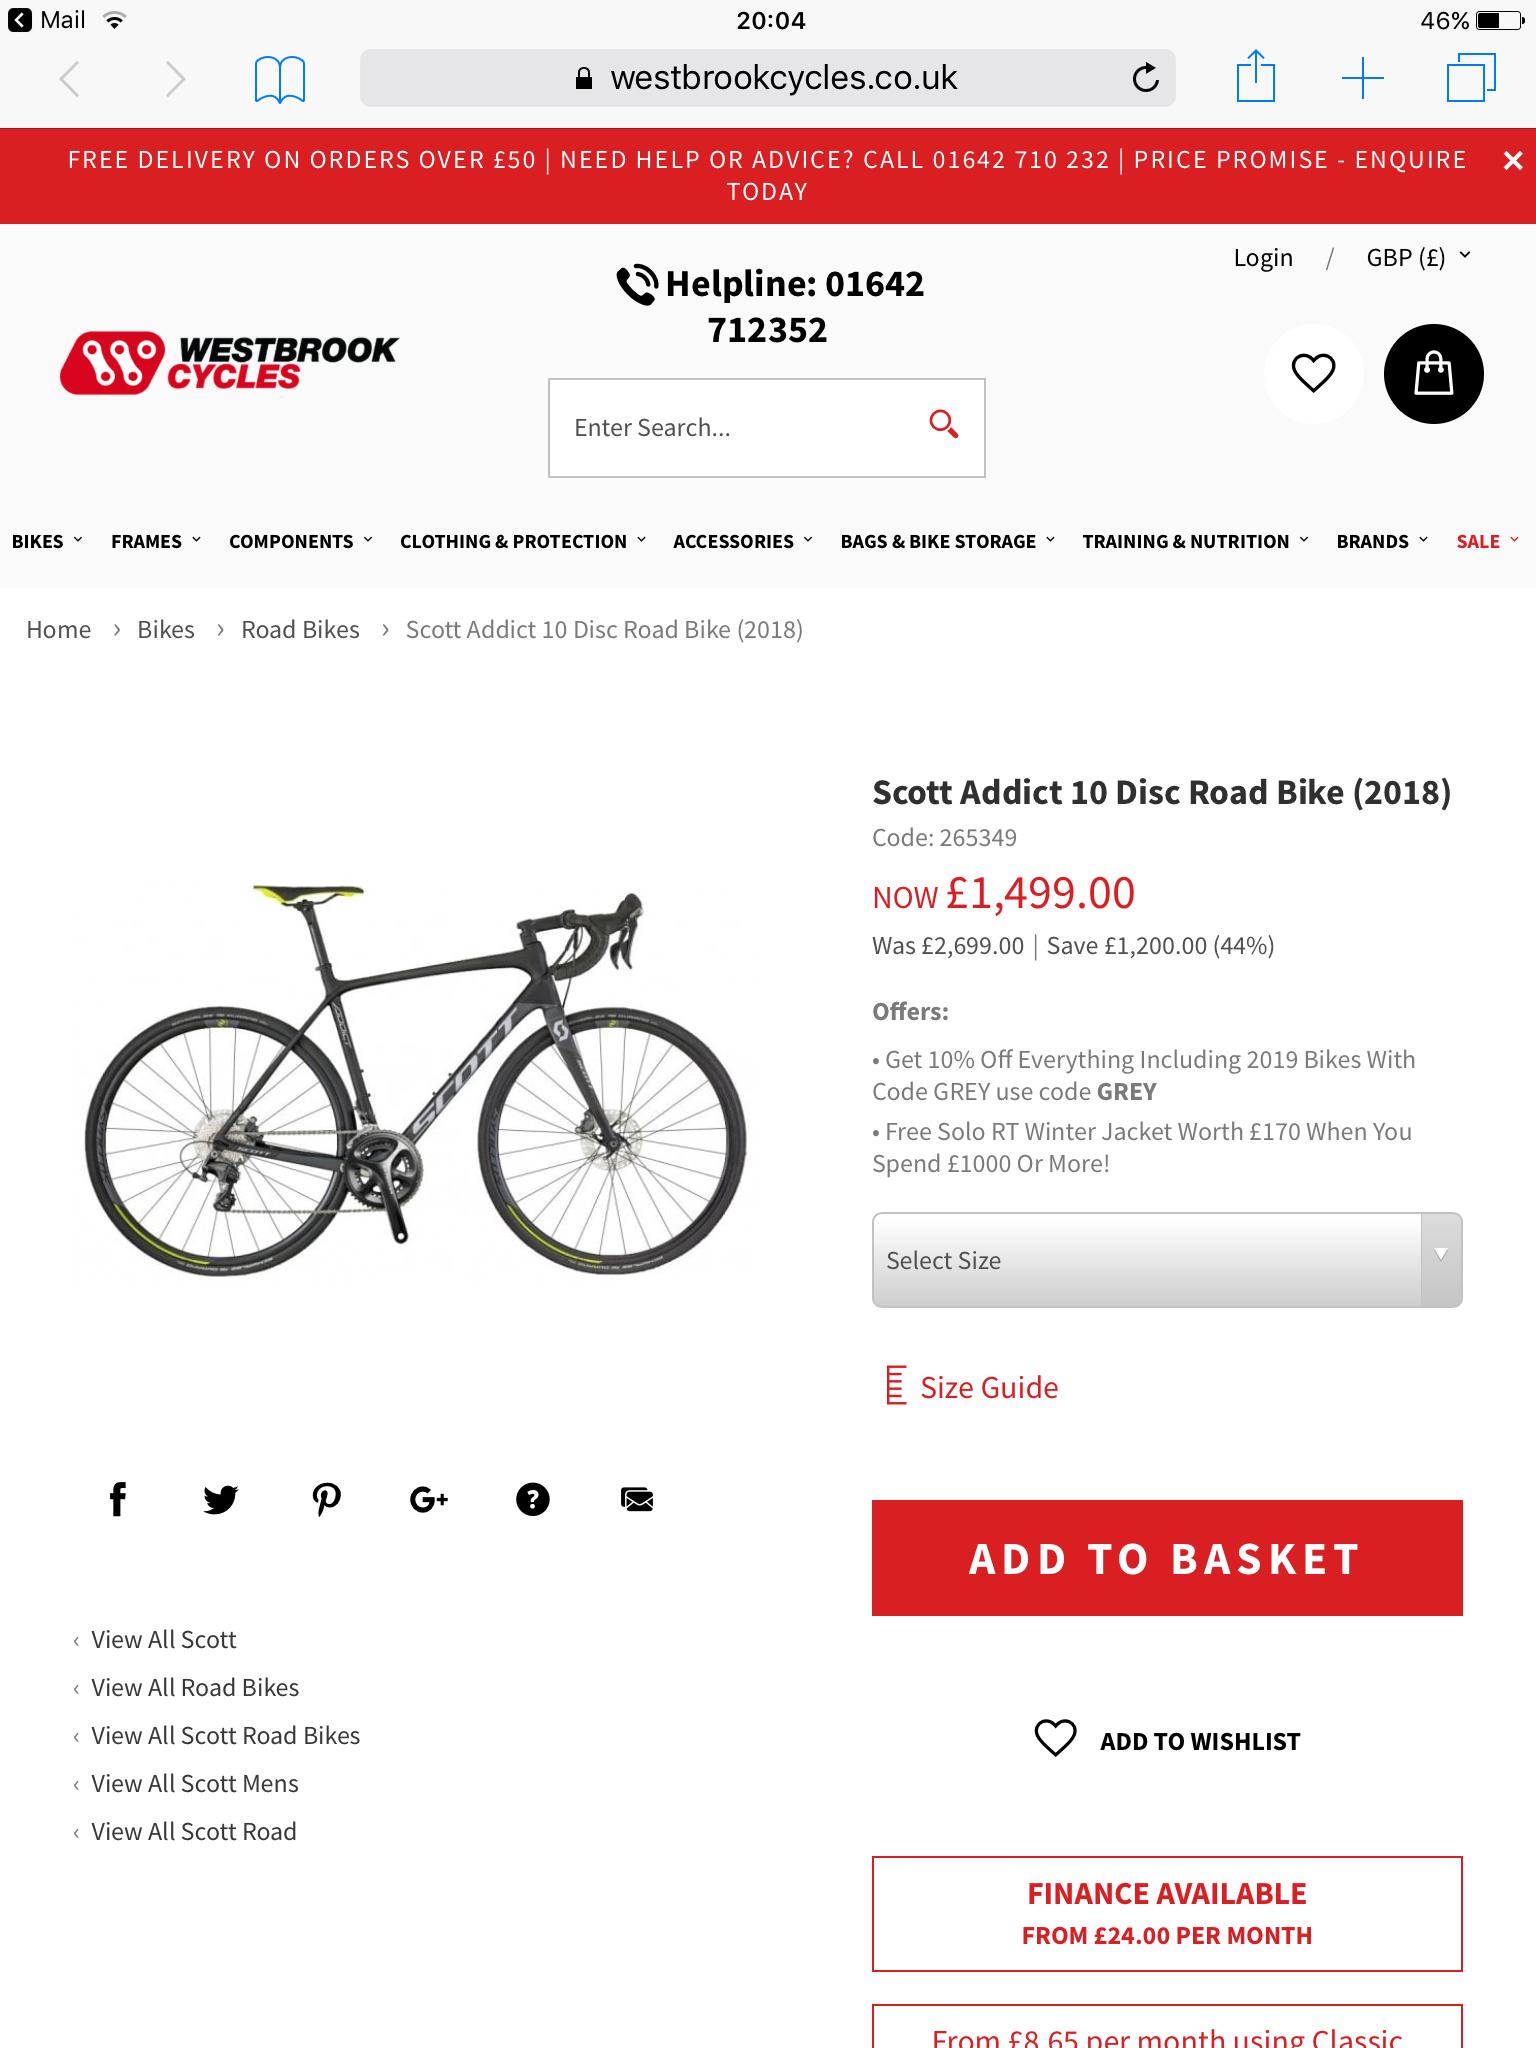 Scott addict 10 disc road bike £1499 @ Westbrook cycles